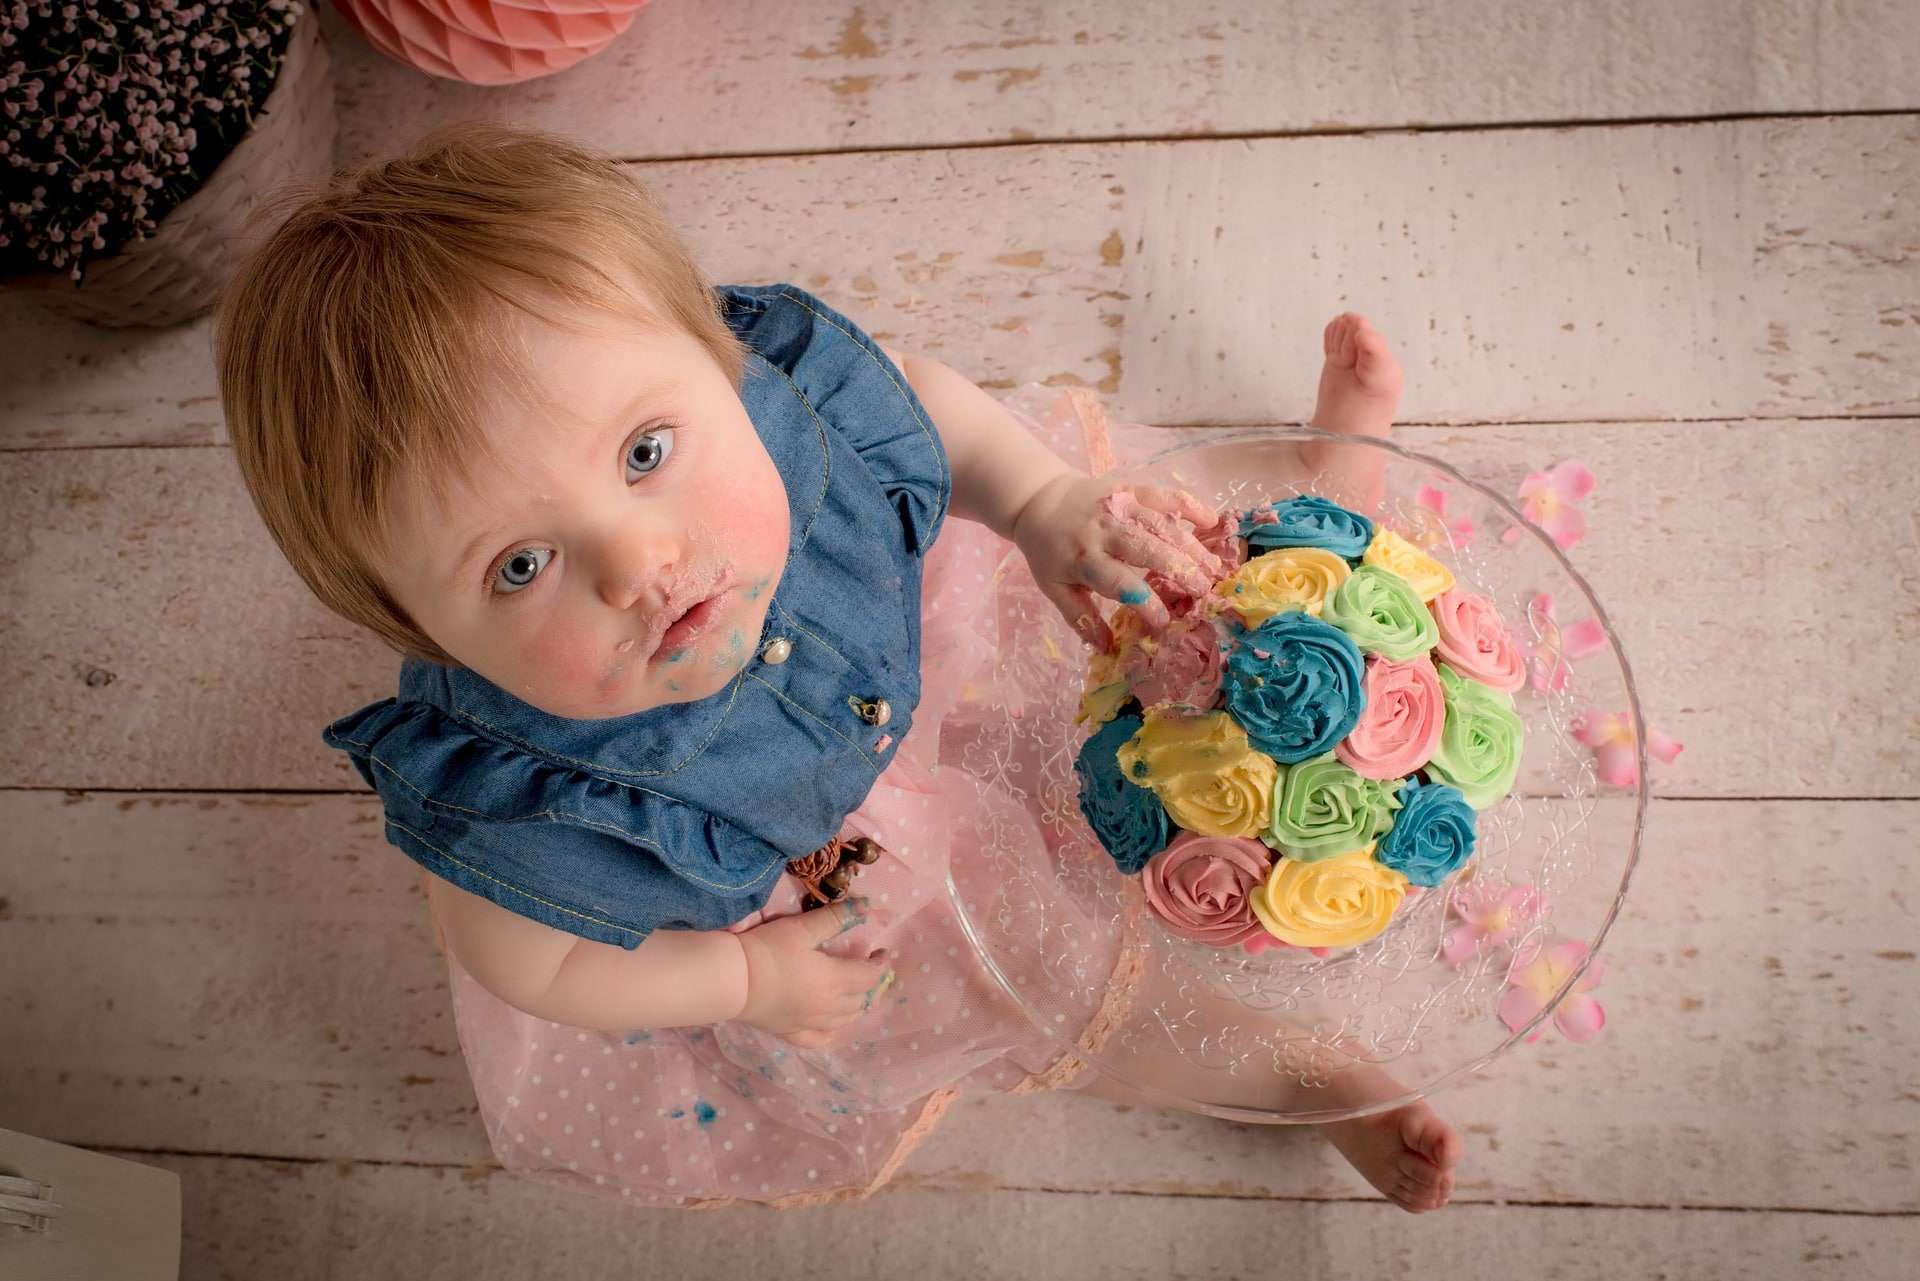 a 2 year old kid enjoying sweets